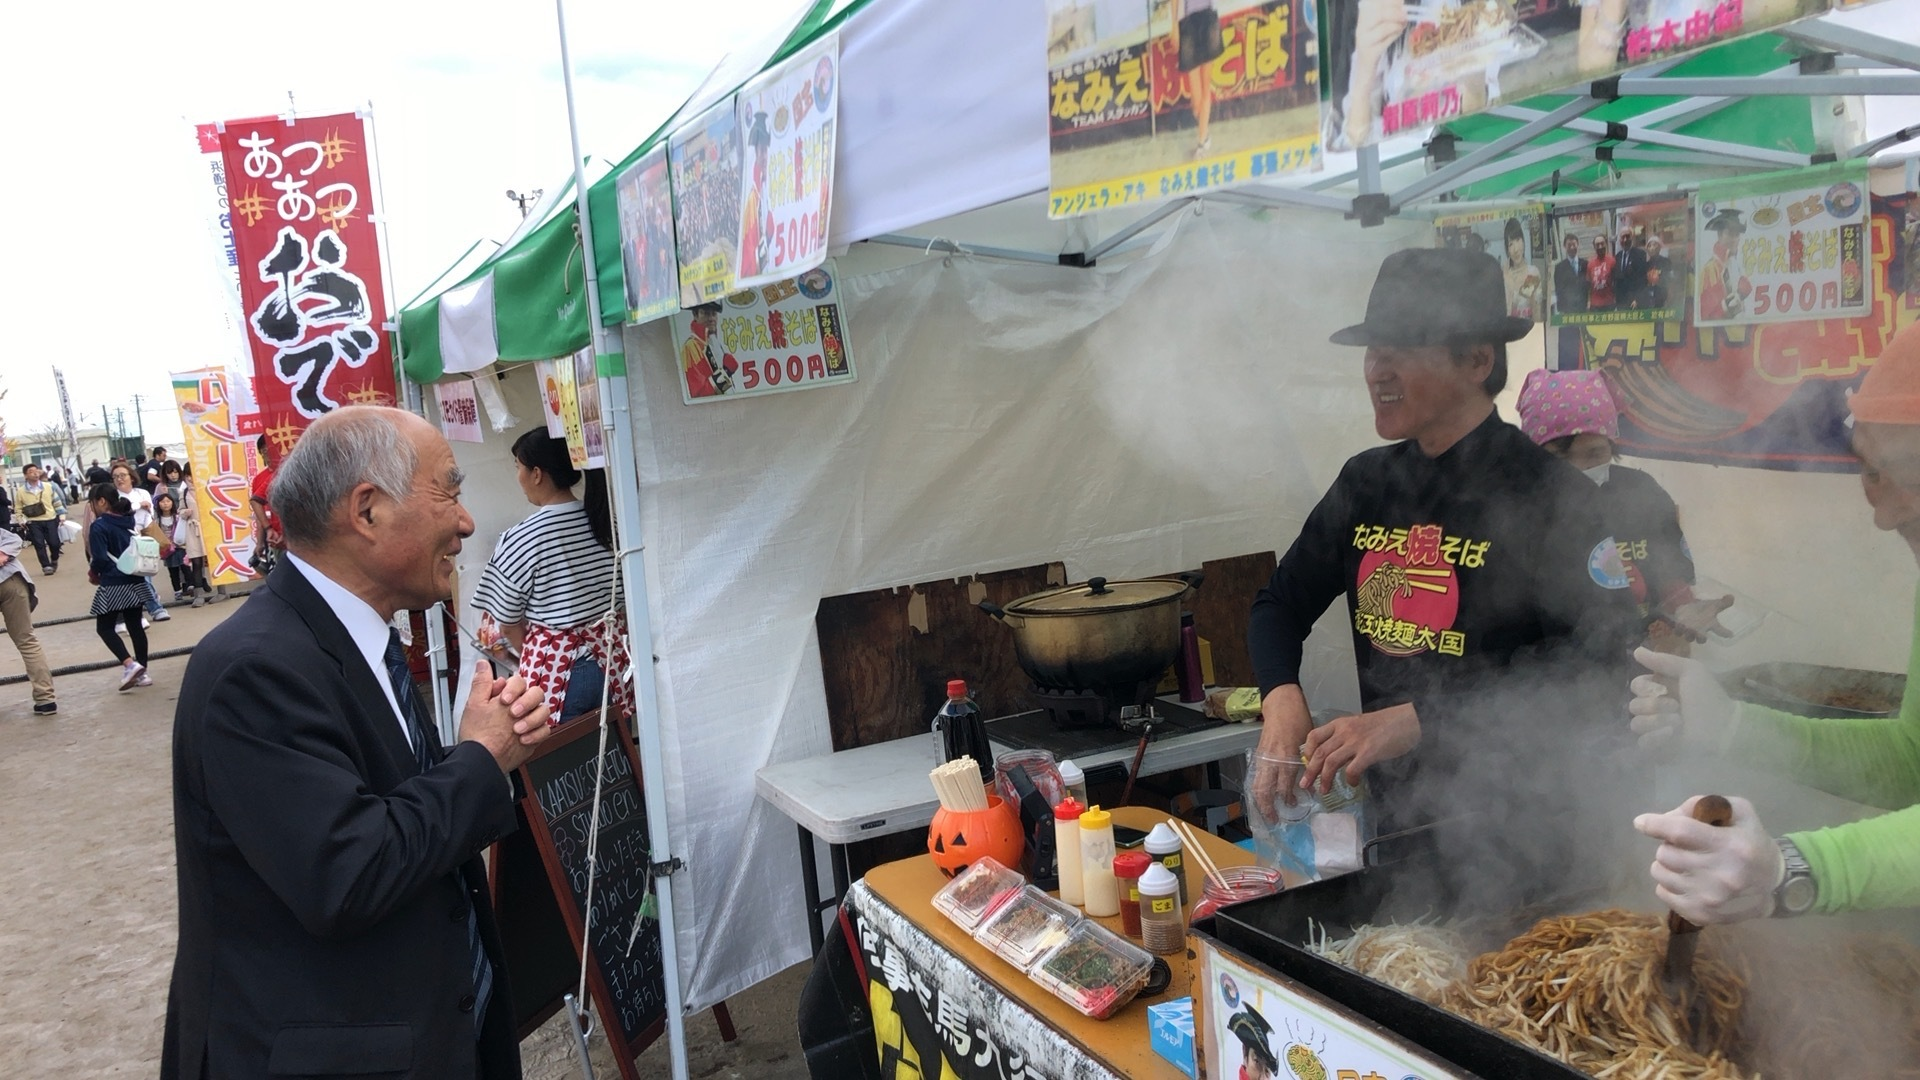 2018.11.10〜11 JAまつり、大熊町ふるさと祭りほか_a0255967_13525907.jpg